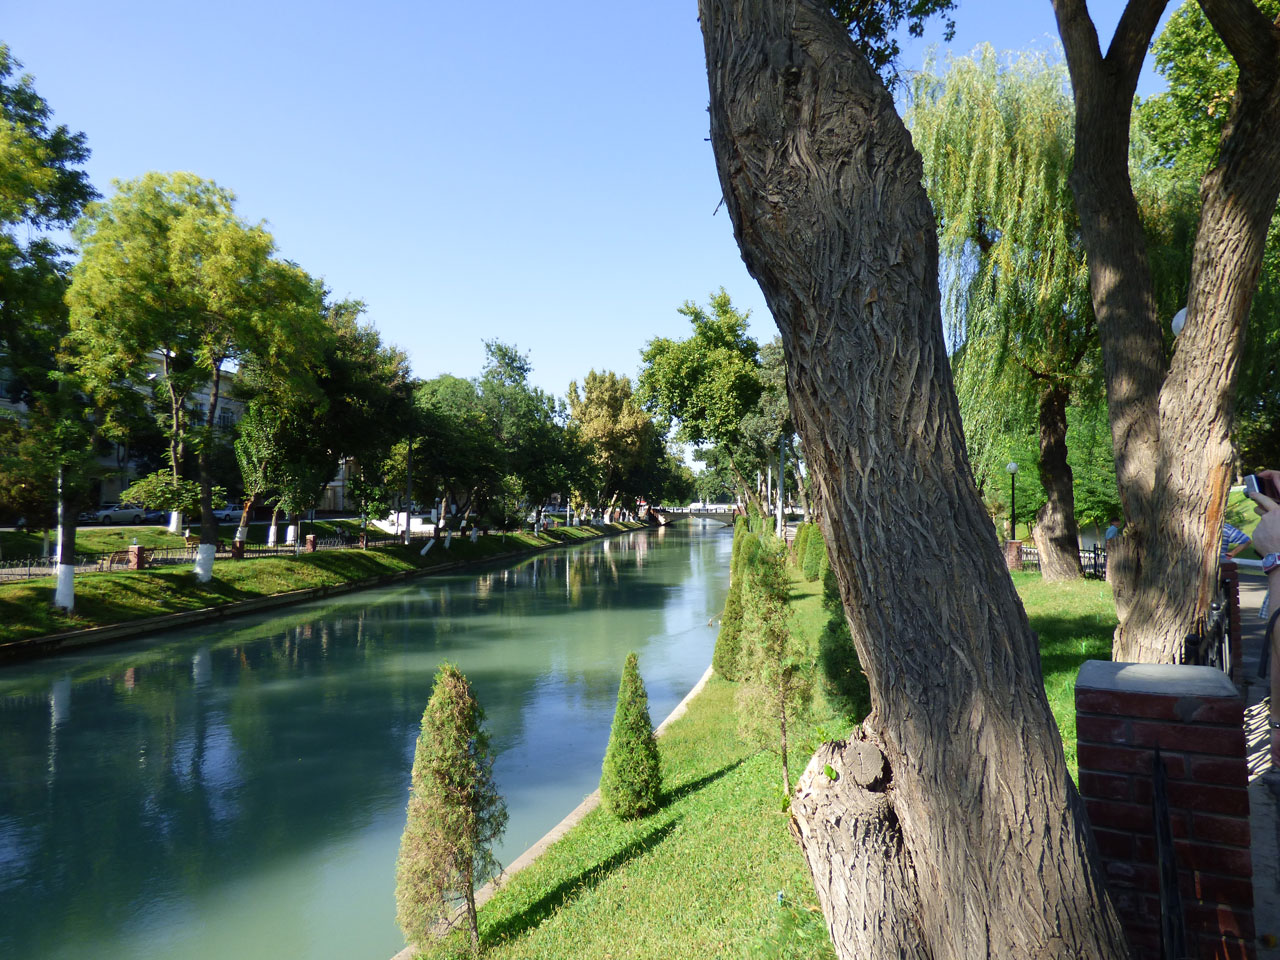 Anhor Canal, Tashkent